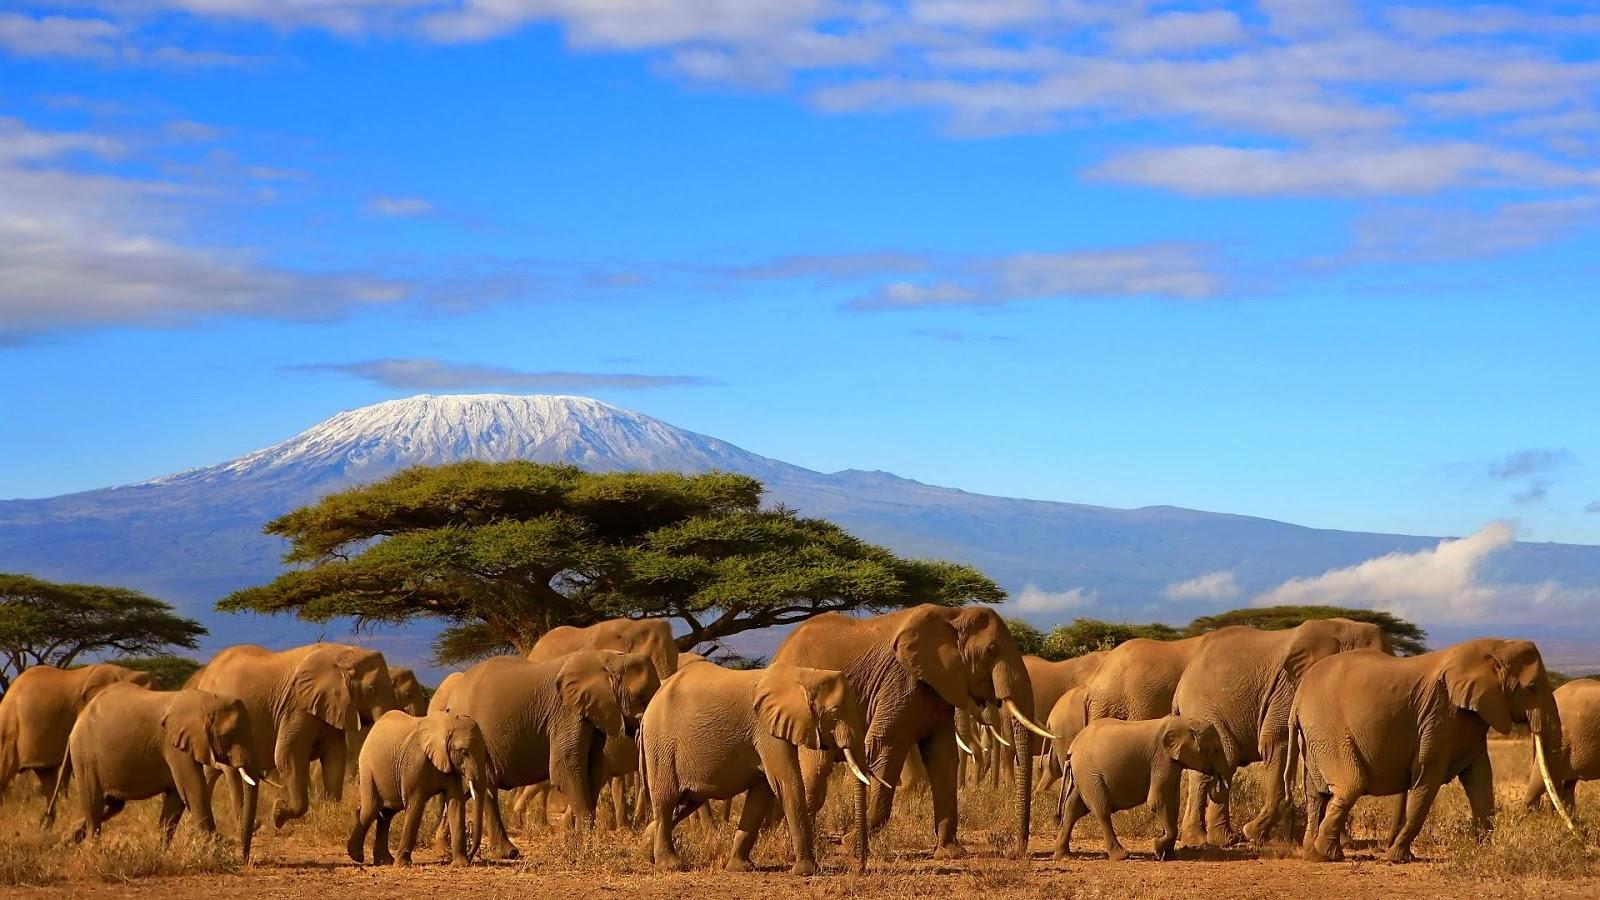 Best Tour Company To Climb Kilimanjaro